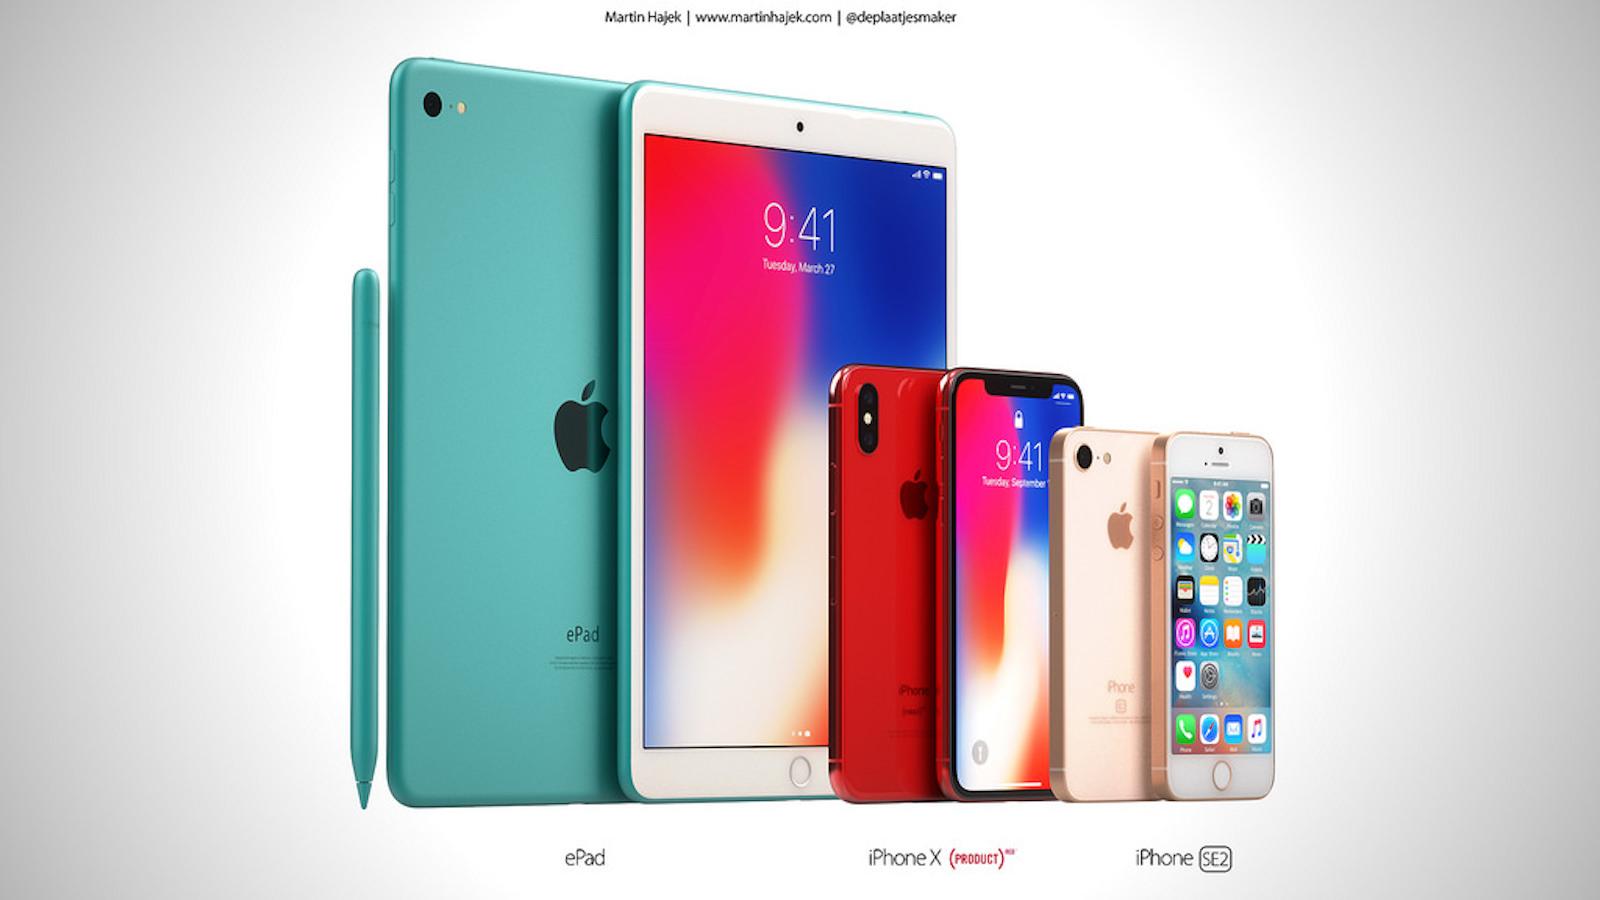 Iphonese2 iphonex red new ipad concept 1